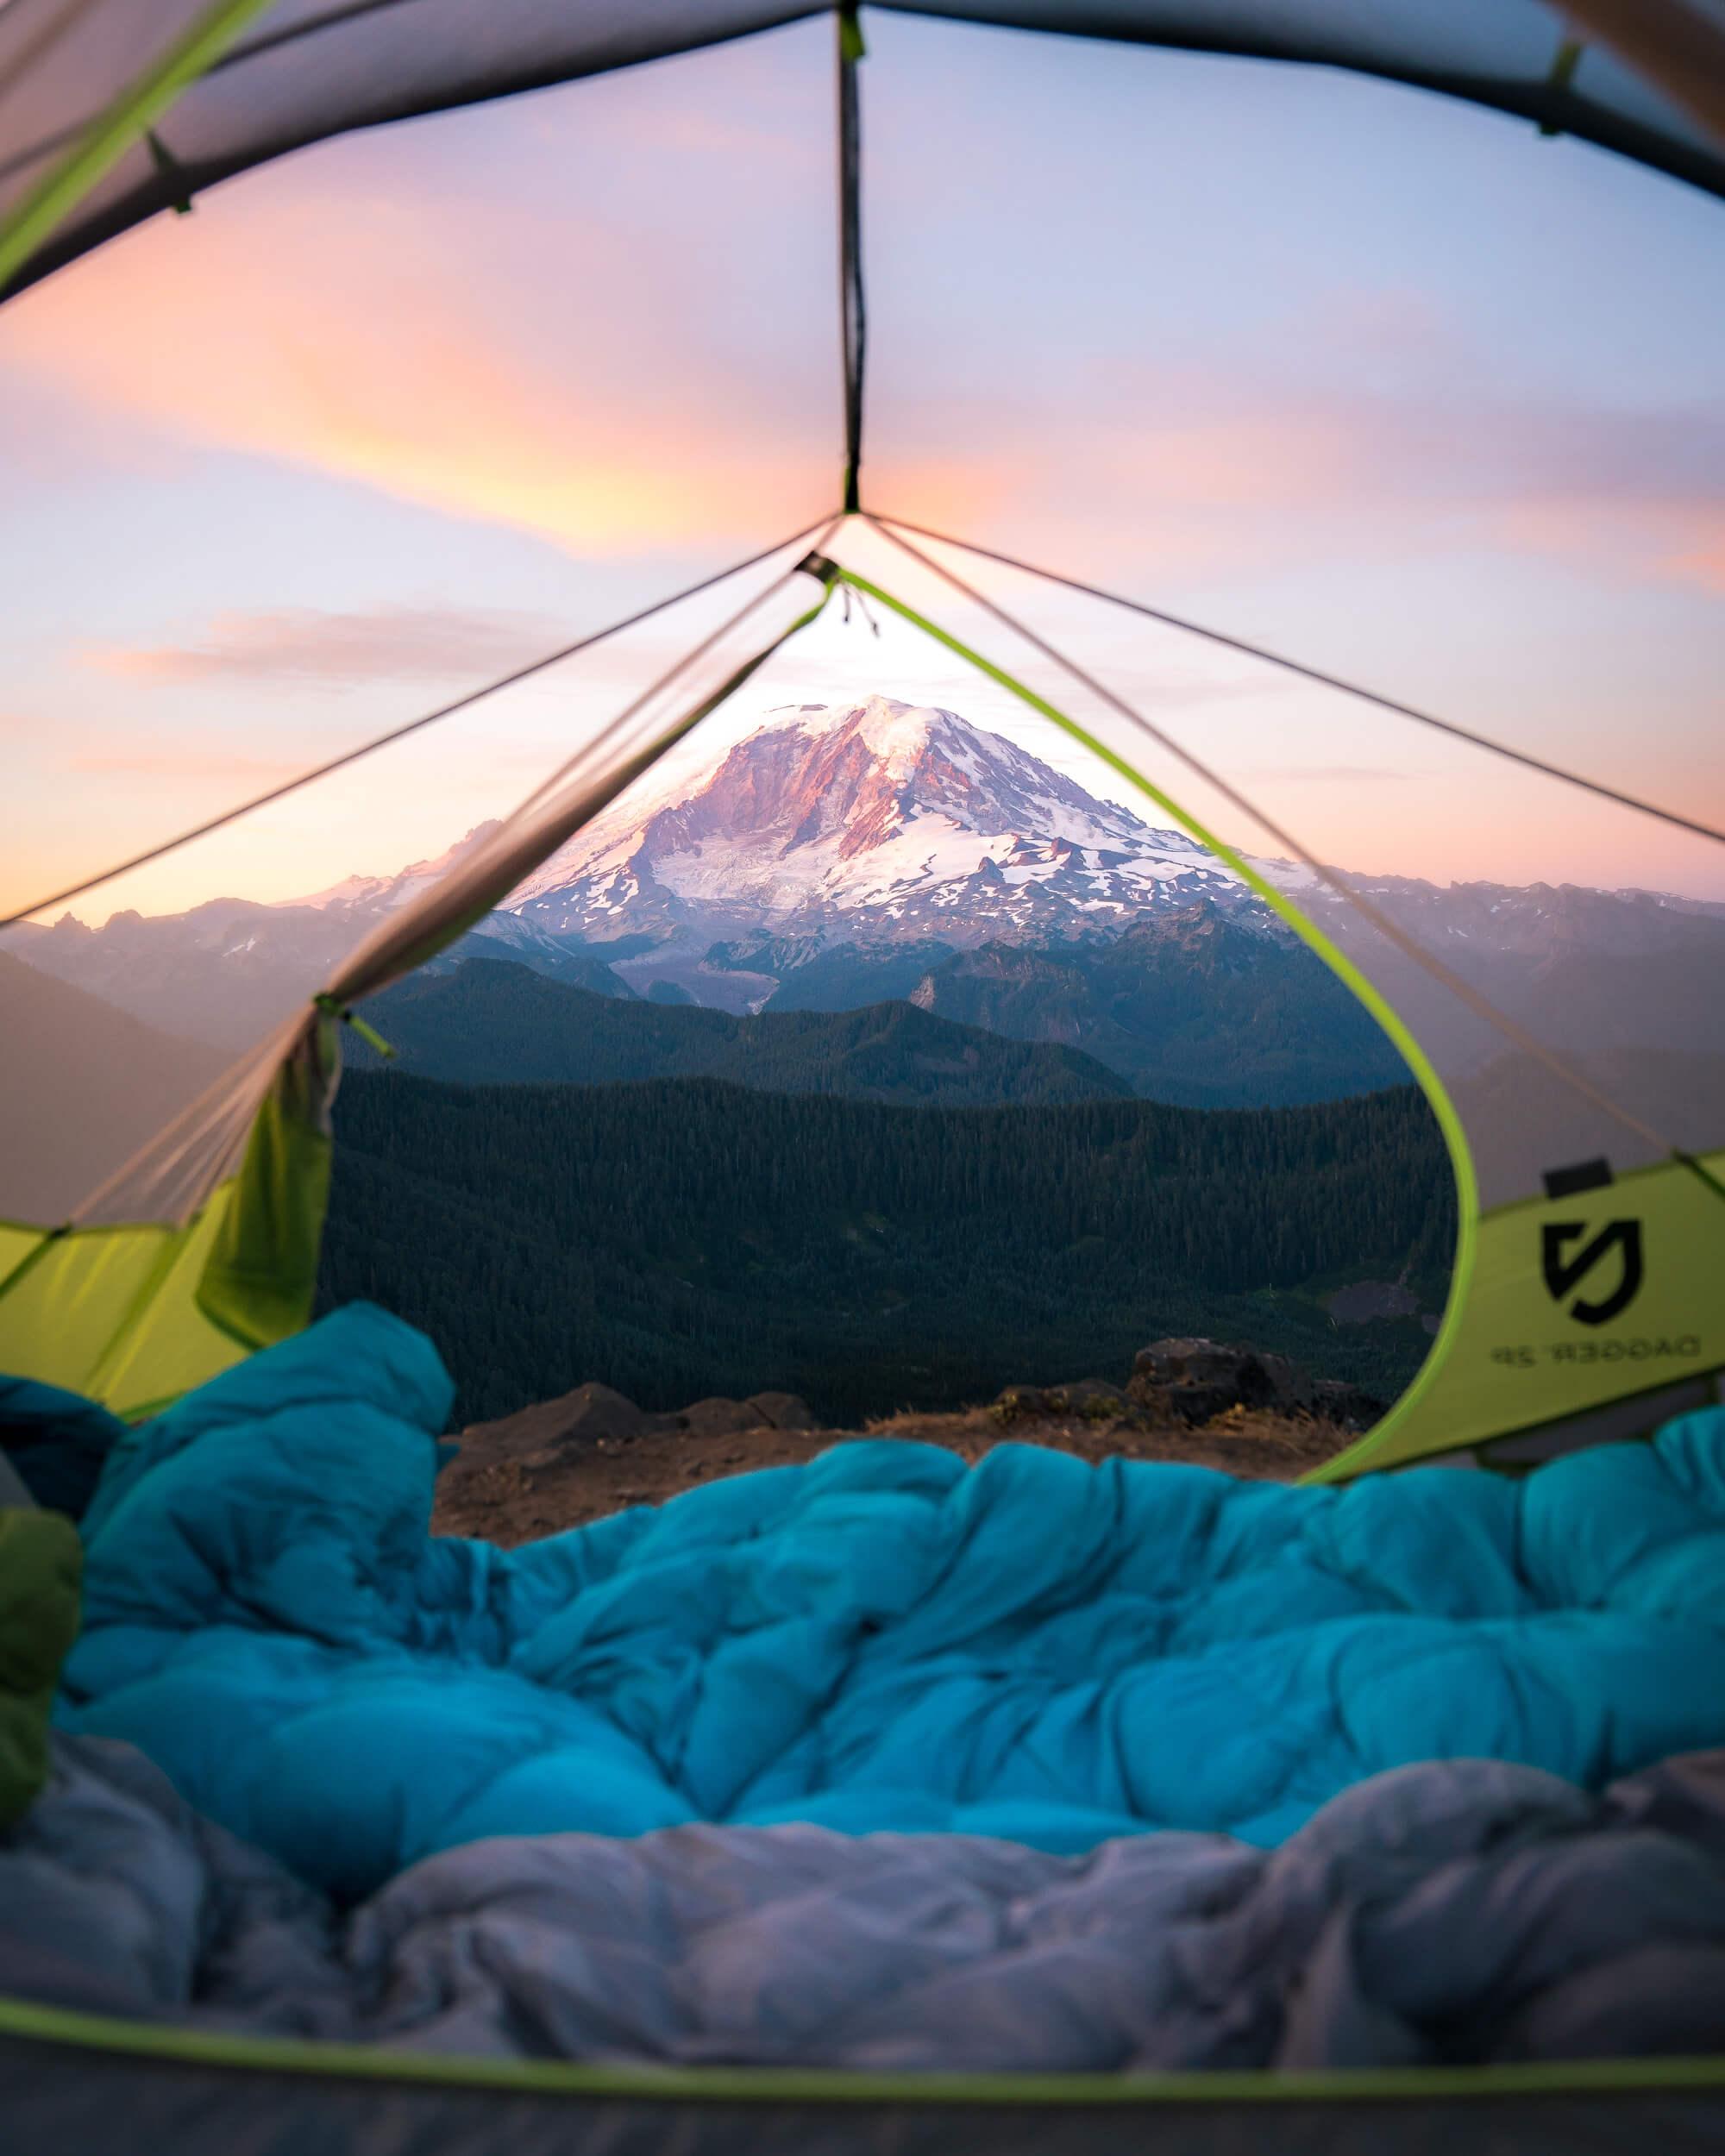 Camp spot at Summit Lake in Washington. Shown in photo:  NEMO Equipment Tent , Marmot 15 Degree  Sleeping Bag .